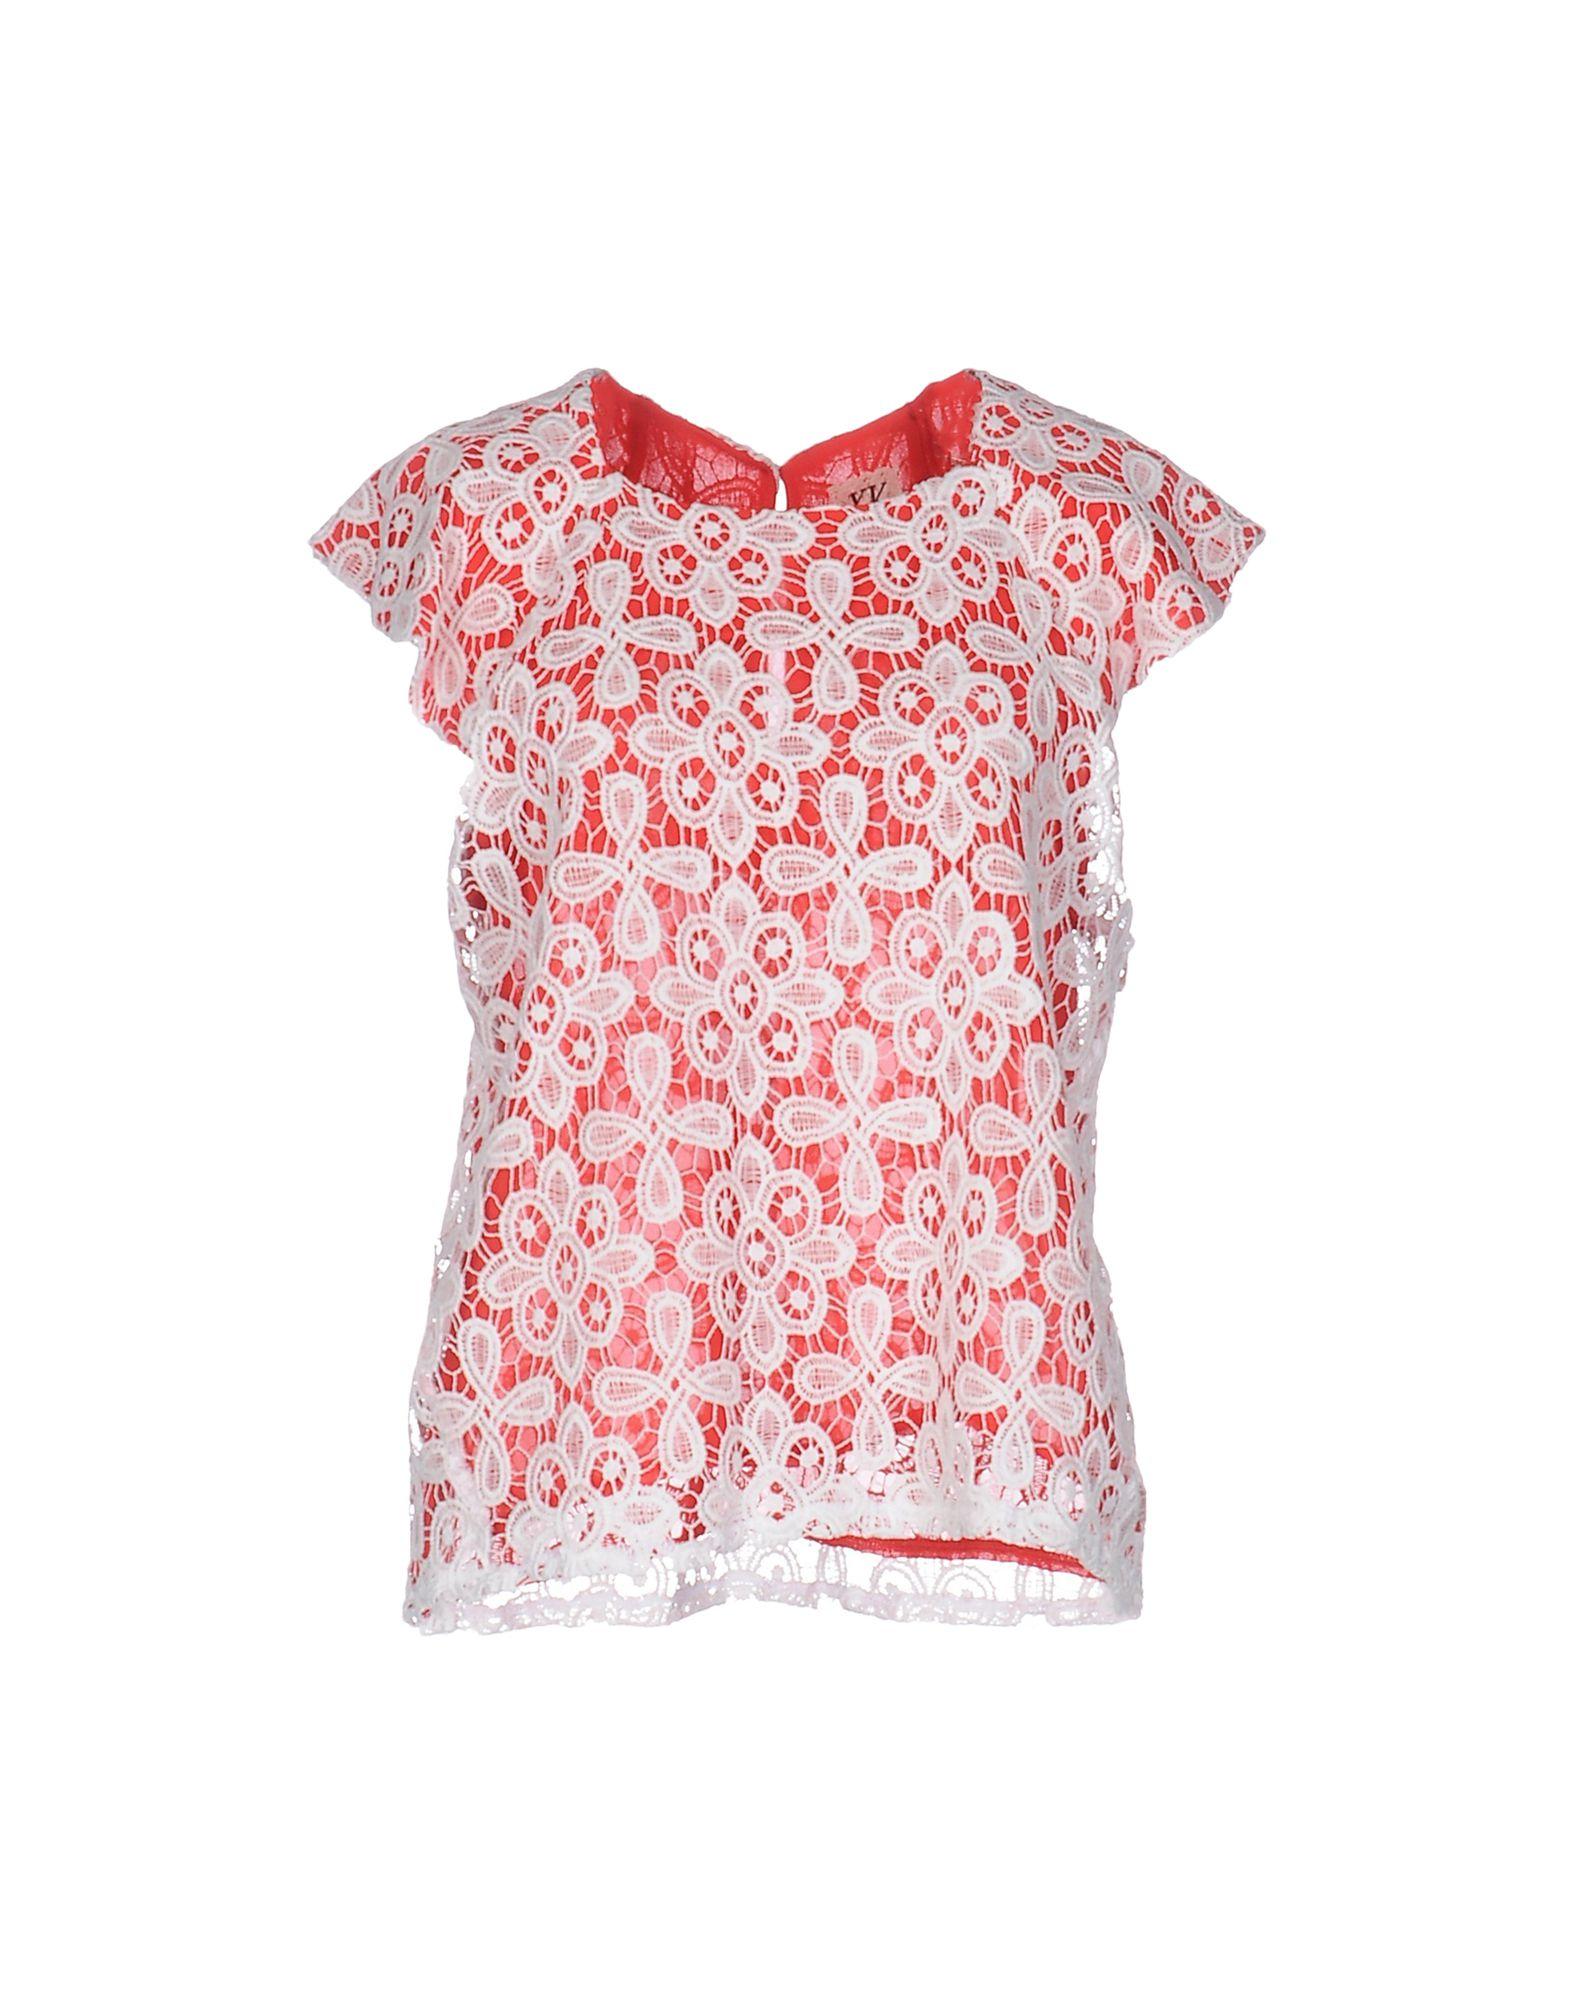 цены на YVALADES Блузка в интернет-магазинах